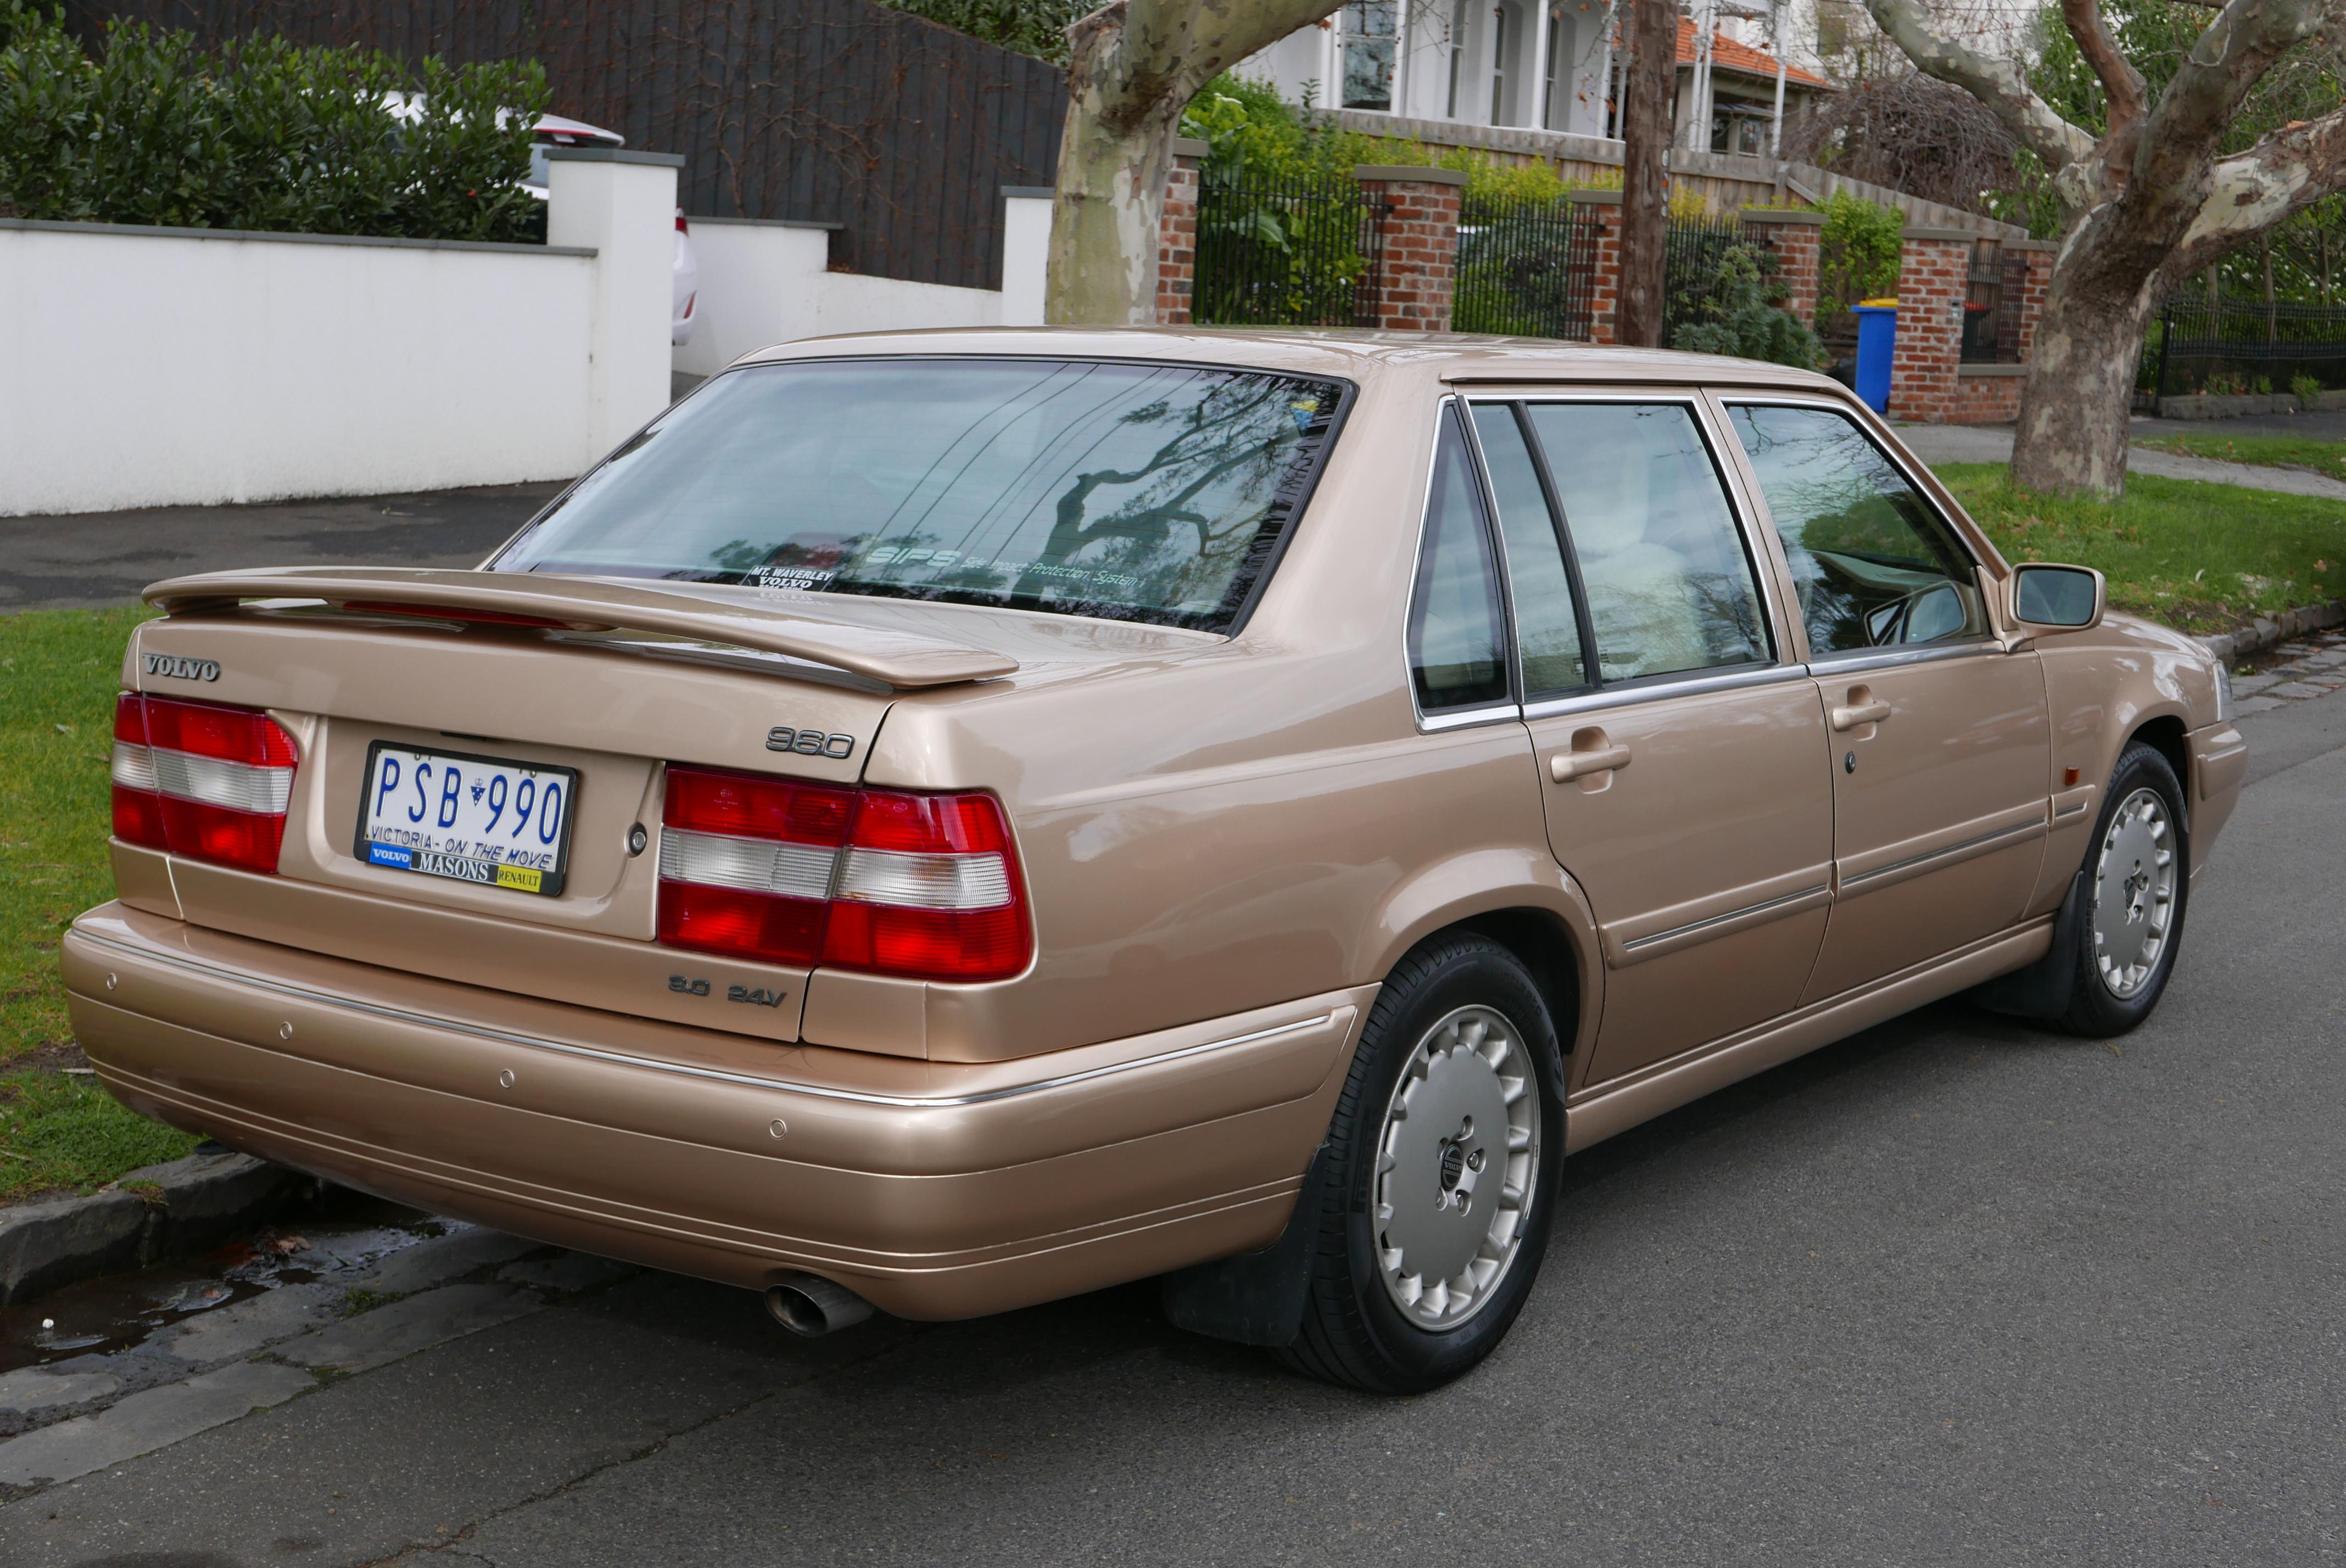 volvo 960 s90 v90 wikipedia wolna encyklopedia rh pl wikipedia org 1997 Volvo 960 Rear Spring Toyota Tercel Manual